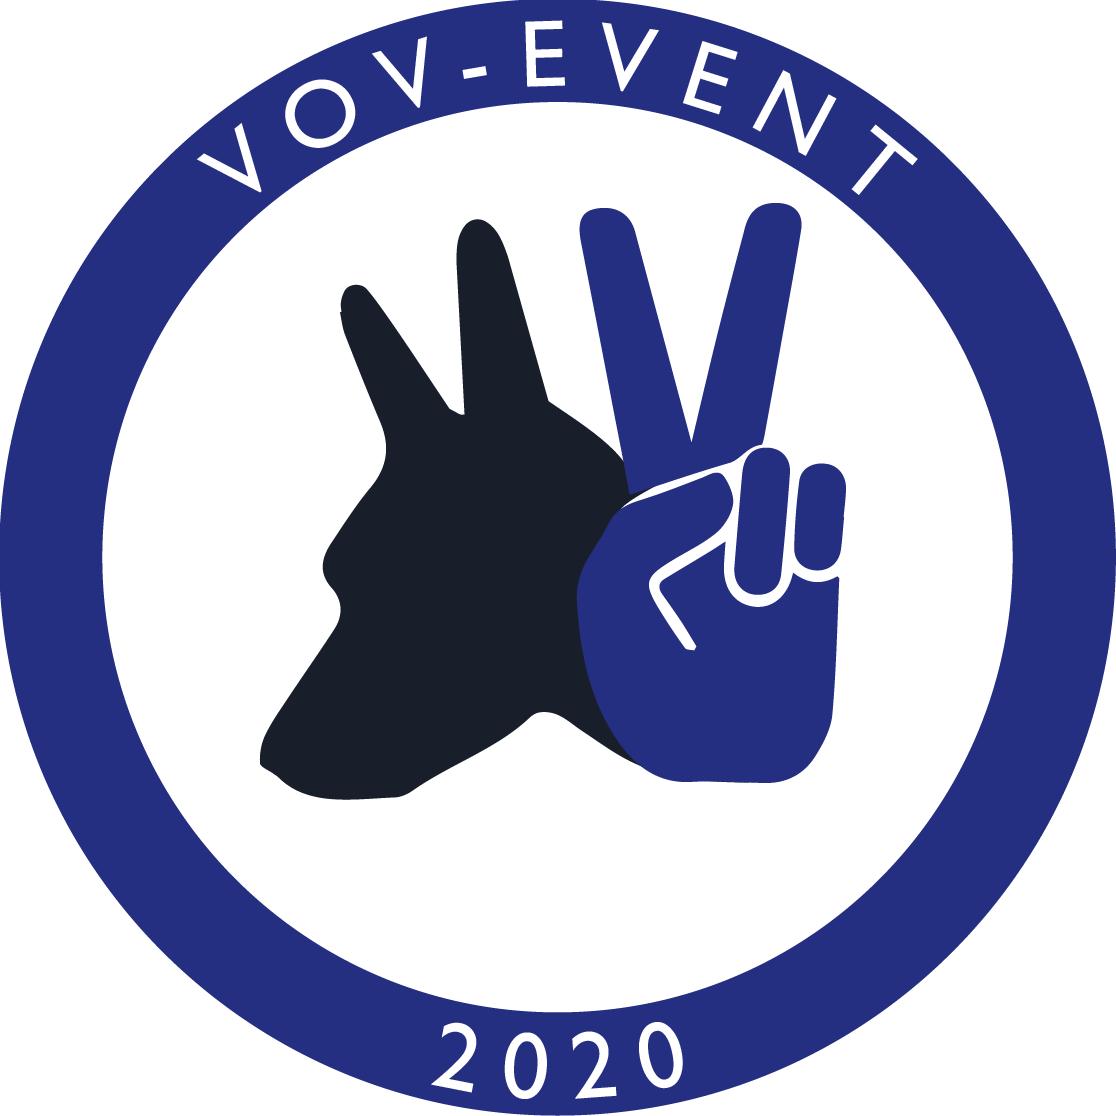 VoV-event logga